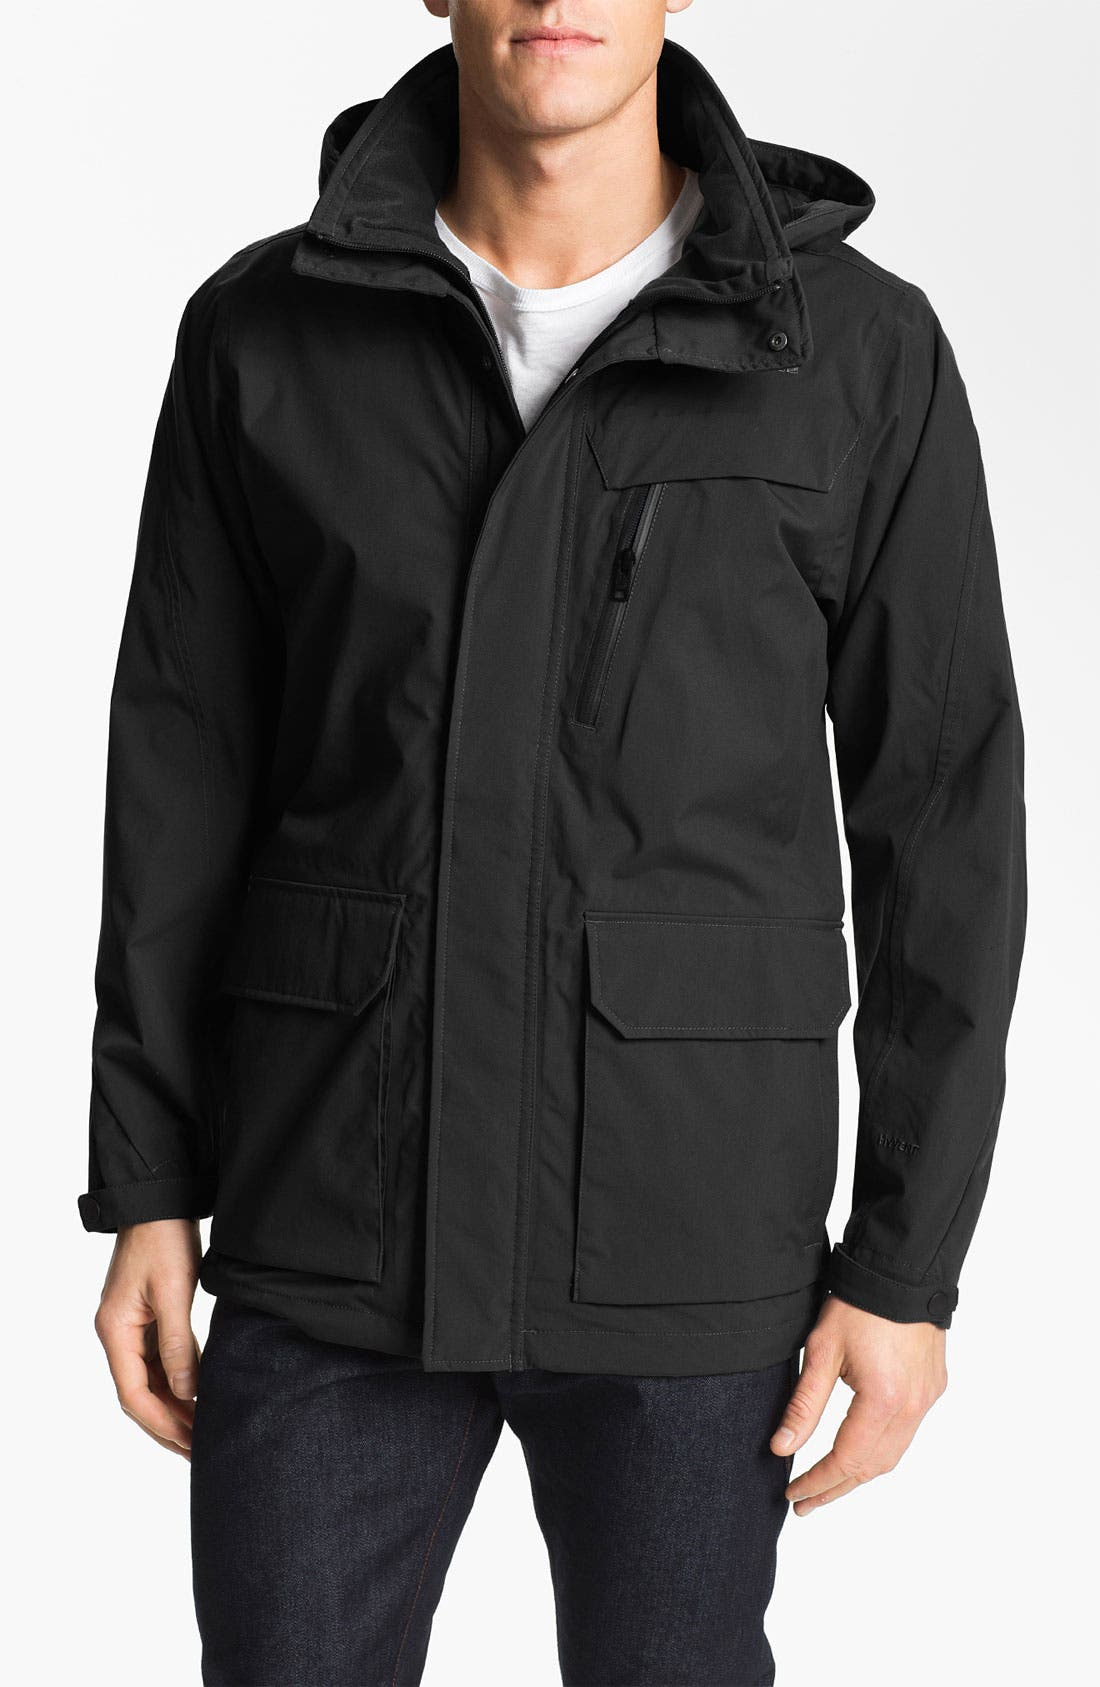 Alternate Image 1 Selected - The North Face 'Kearny' Waterproof Hooded Jacket